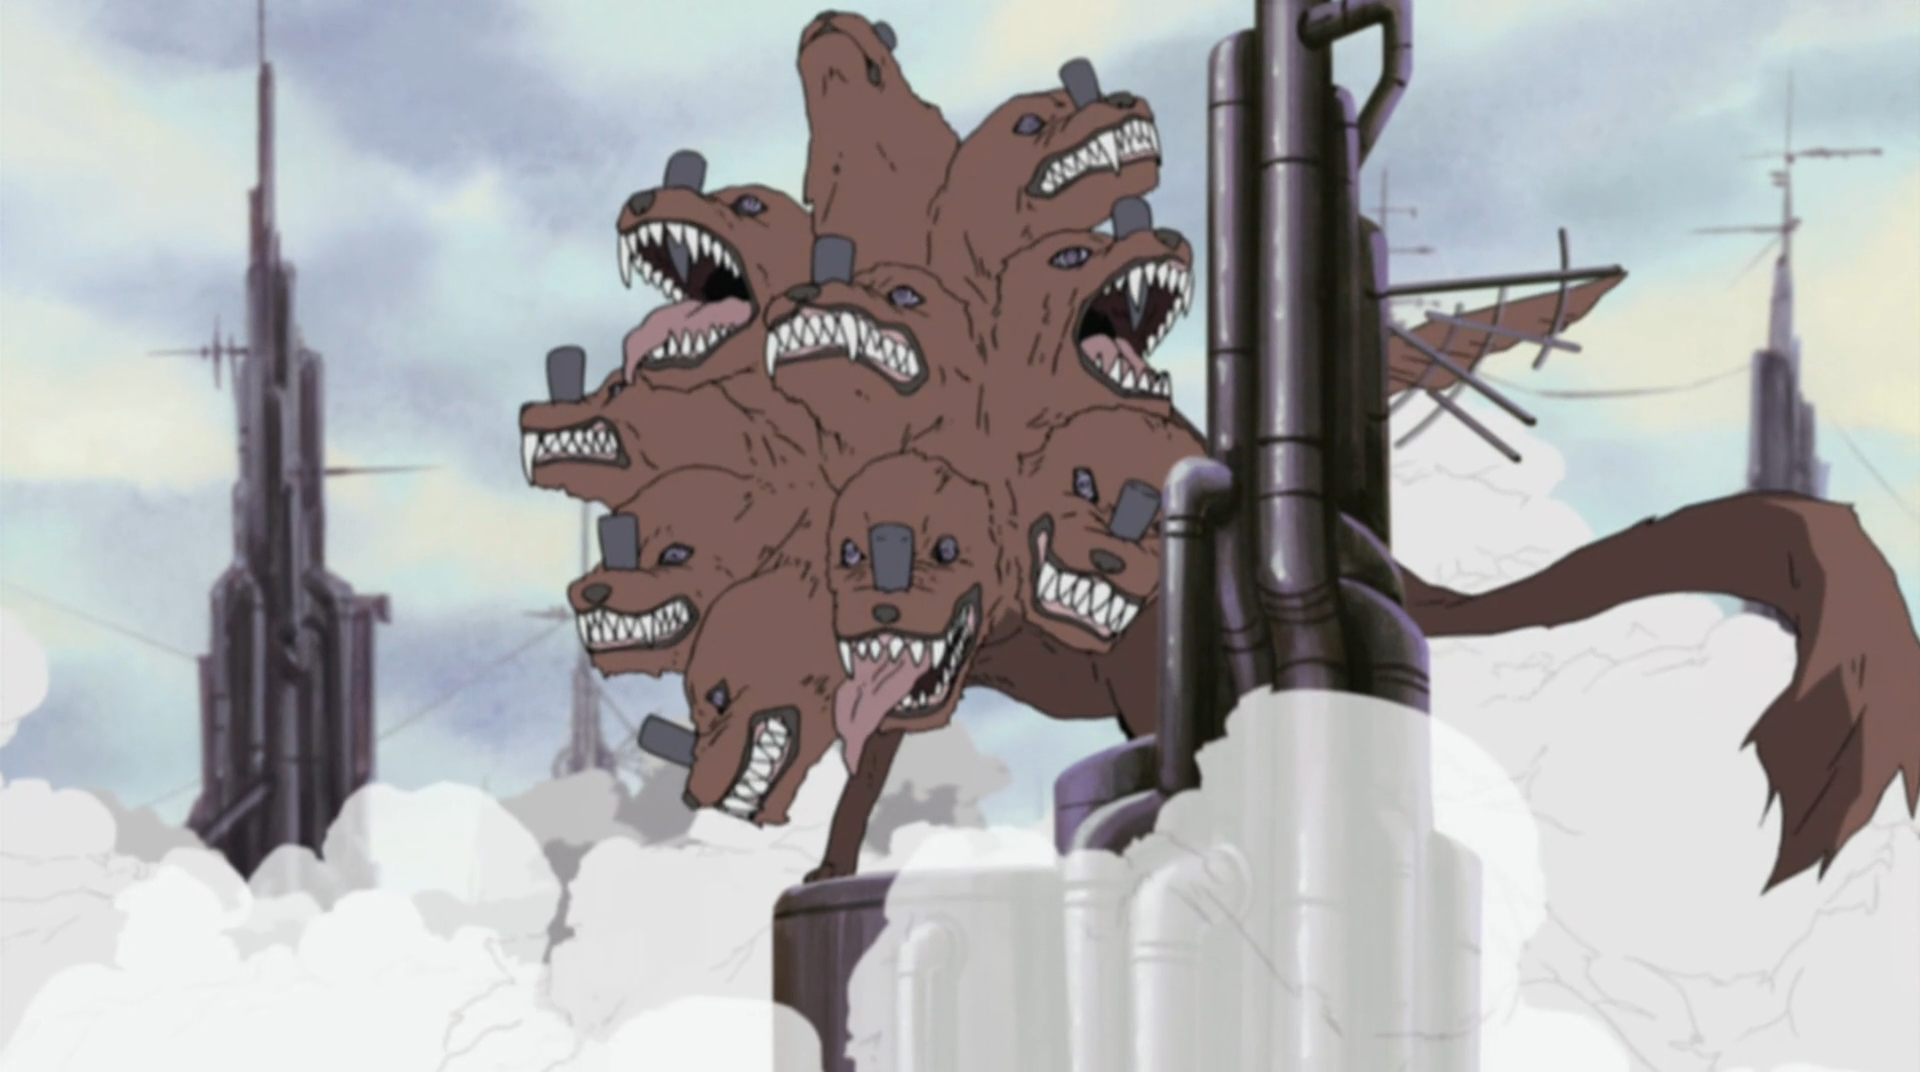 Giant Multi-Headed Dog | Narutopedia | FANDOM powered by Wikia - photo#2